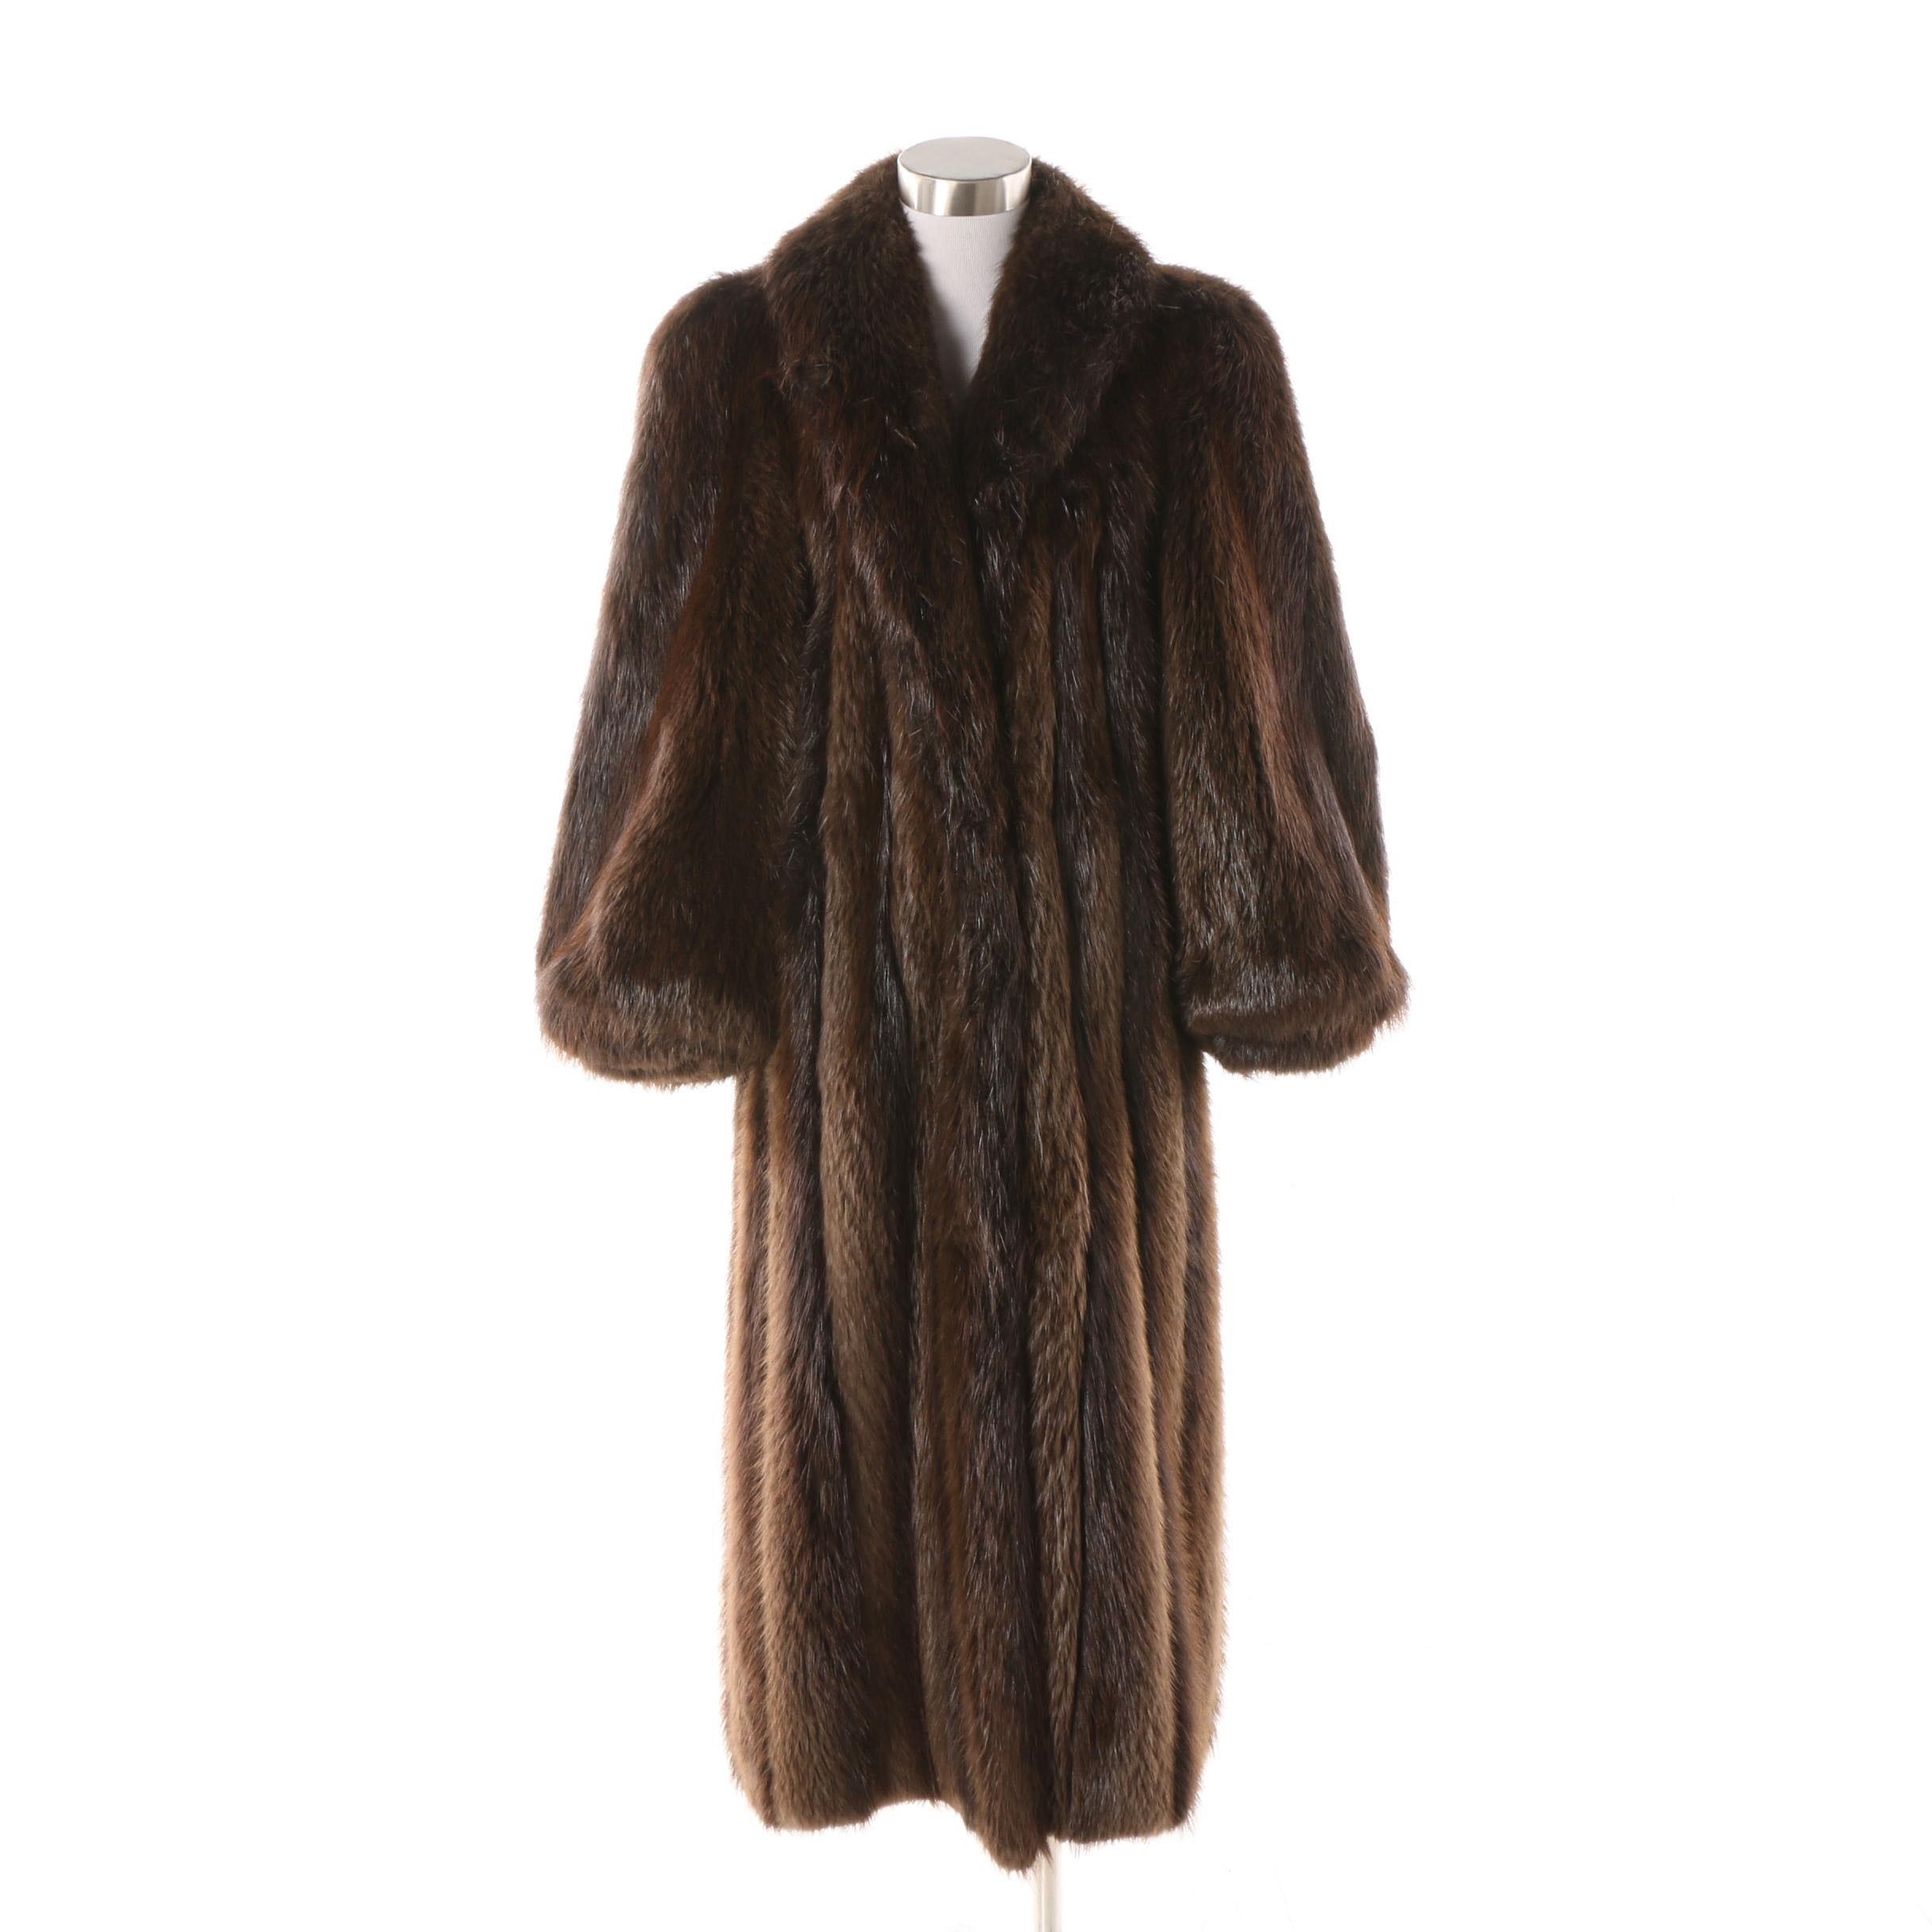 Circa 1980s Kastil Furs Beaver Fur Coat